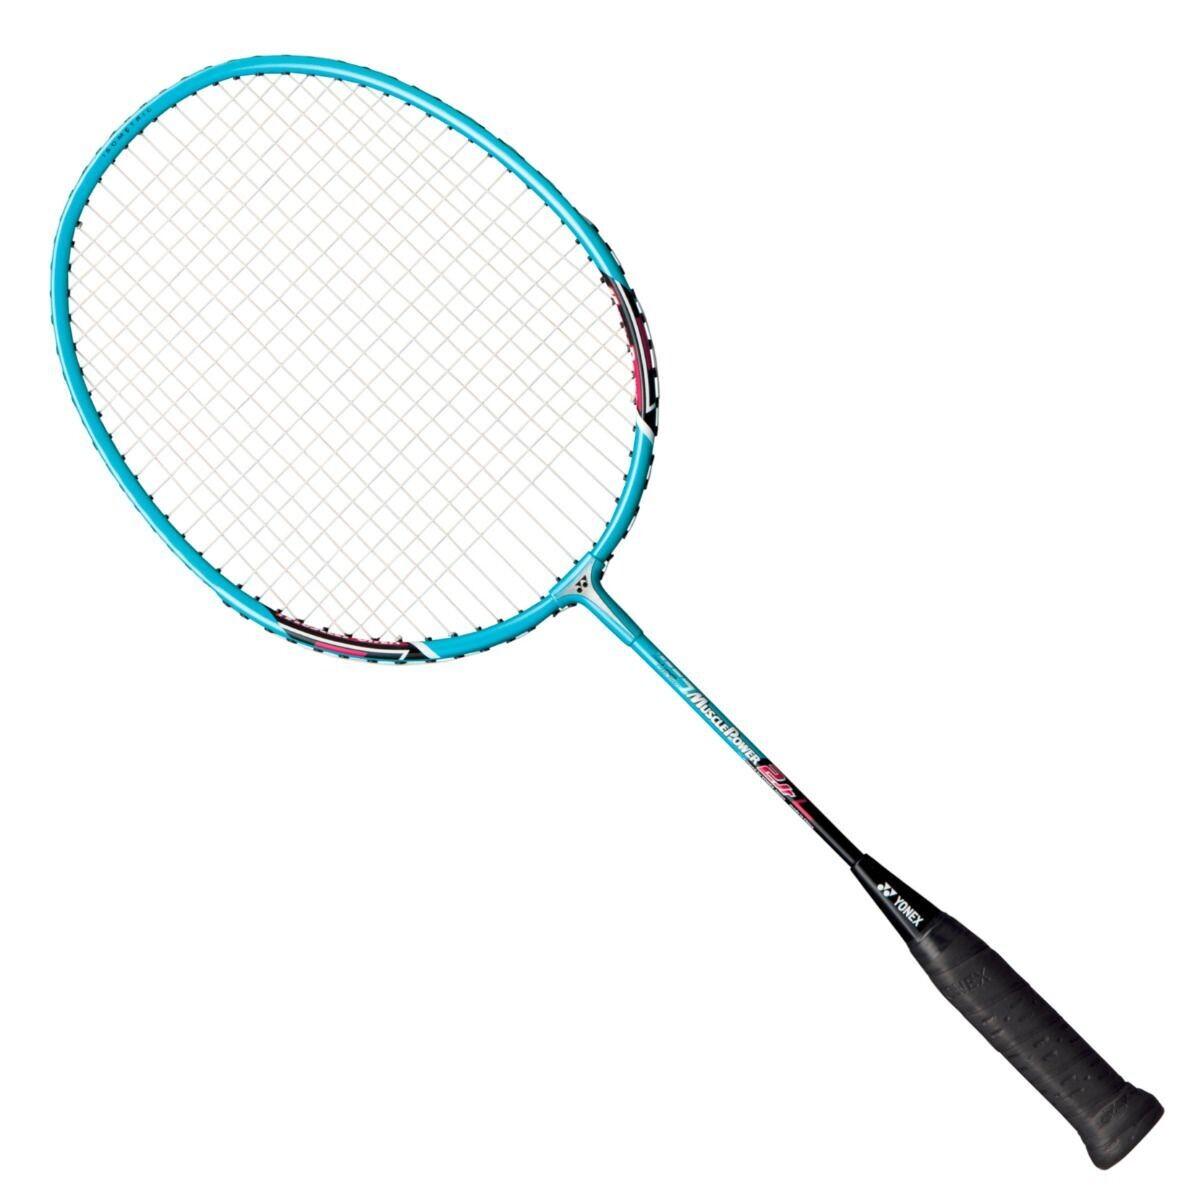 Yonex Muscle Power 2 Junior Badminton Racket - Blue